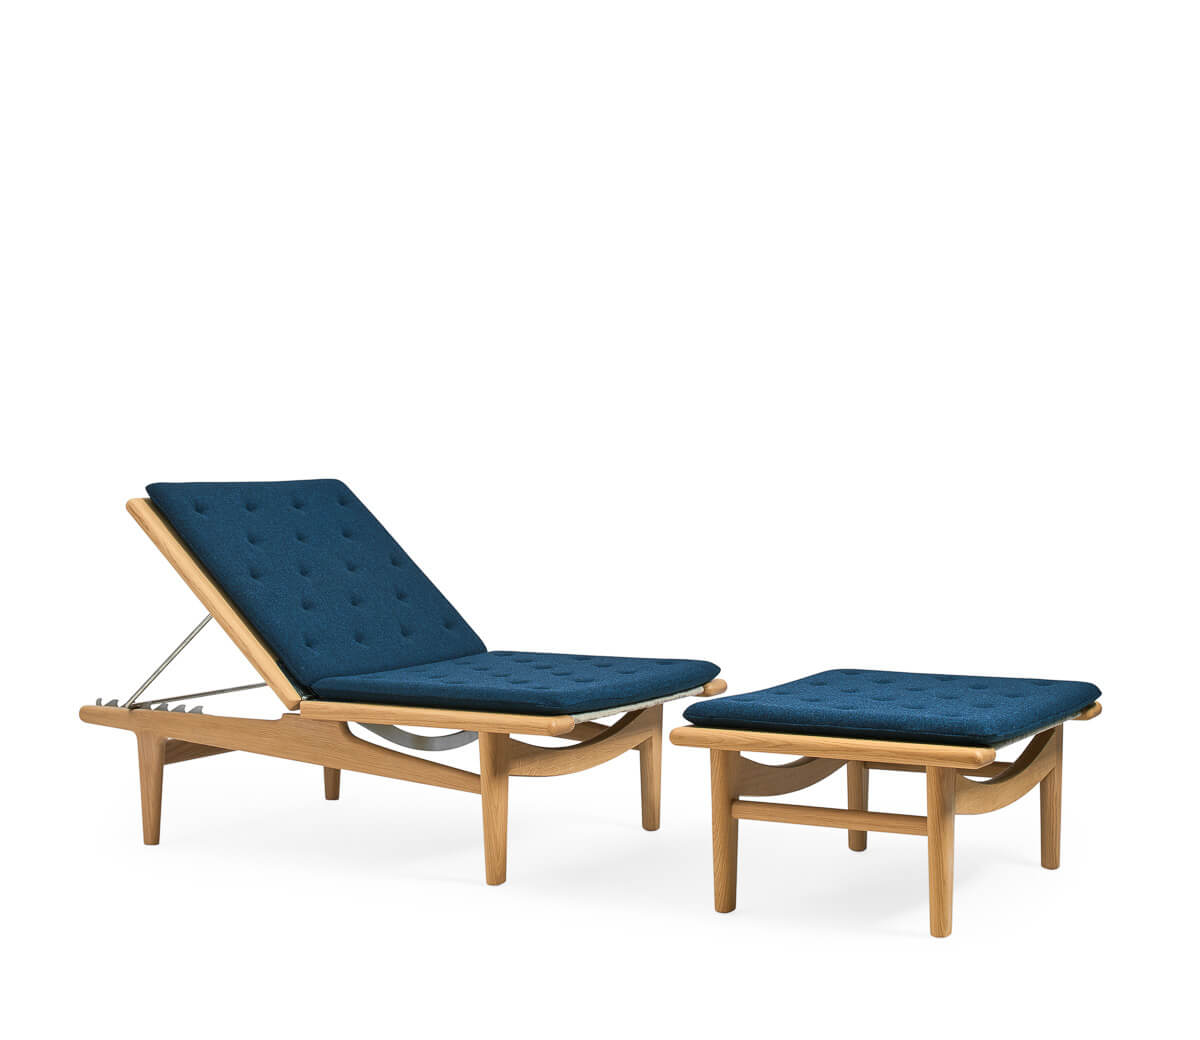 GE1 Lounge Chair (Bench)